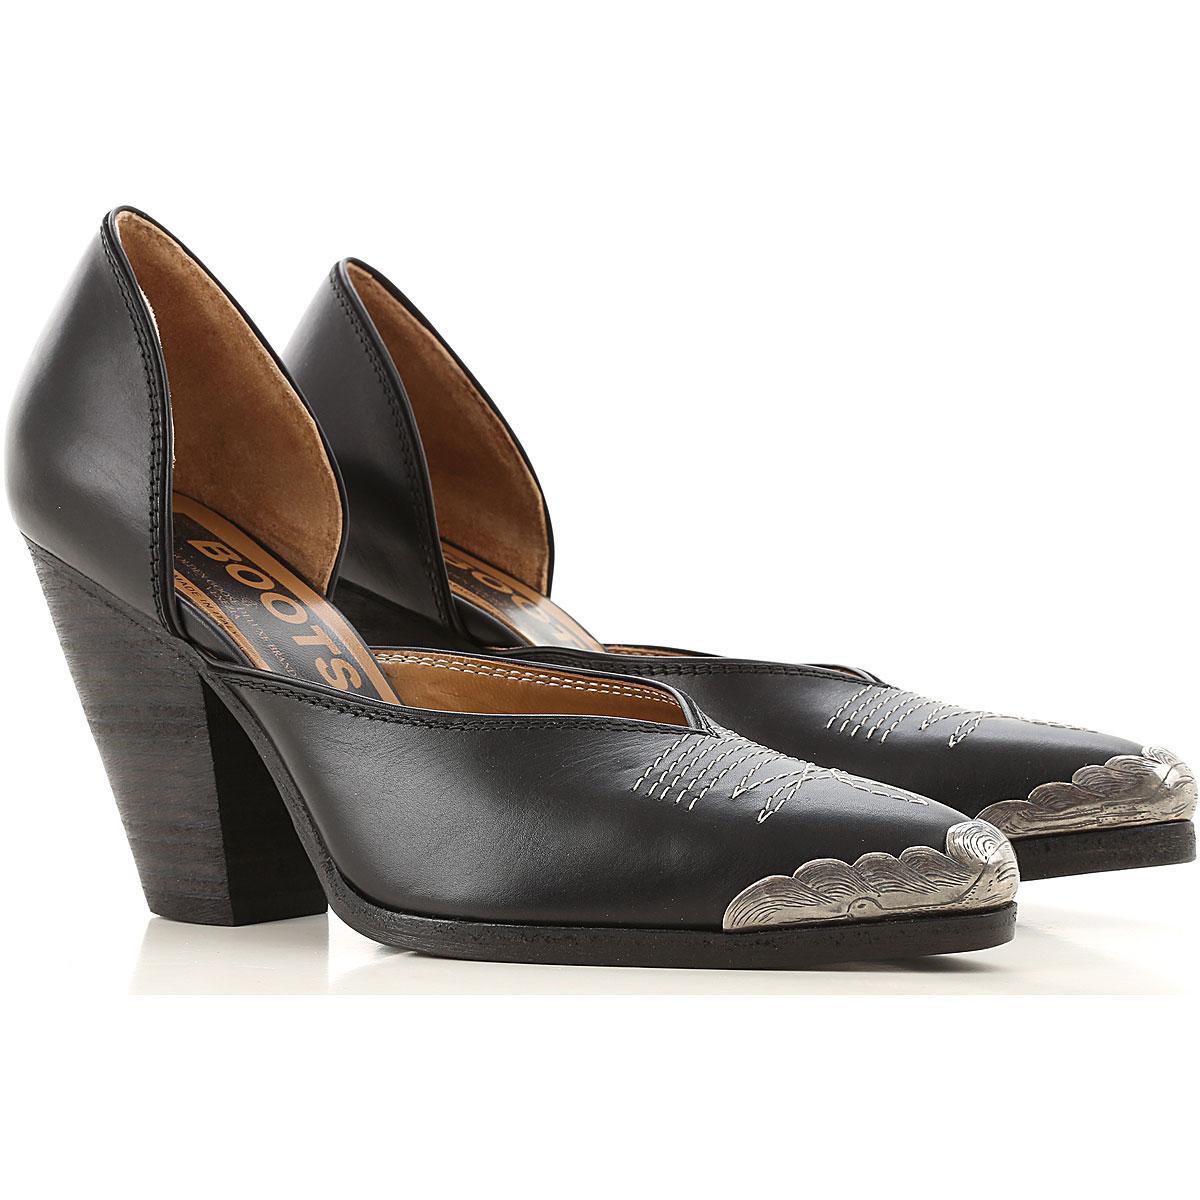 Golden Goose Sandals Heeled Womens On Sale, Black, Leather, 2019, 6 7 9